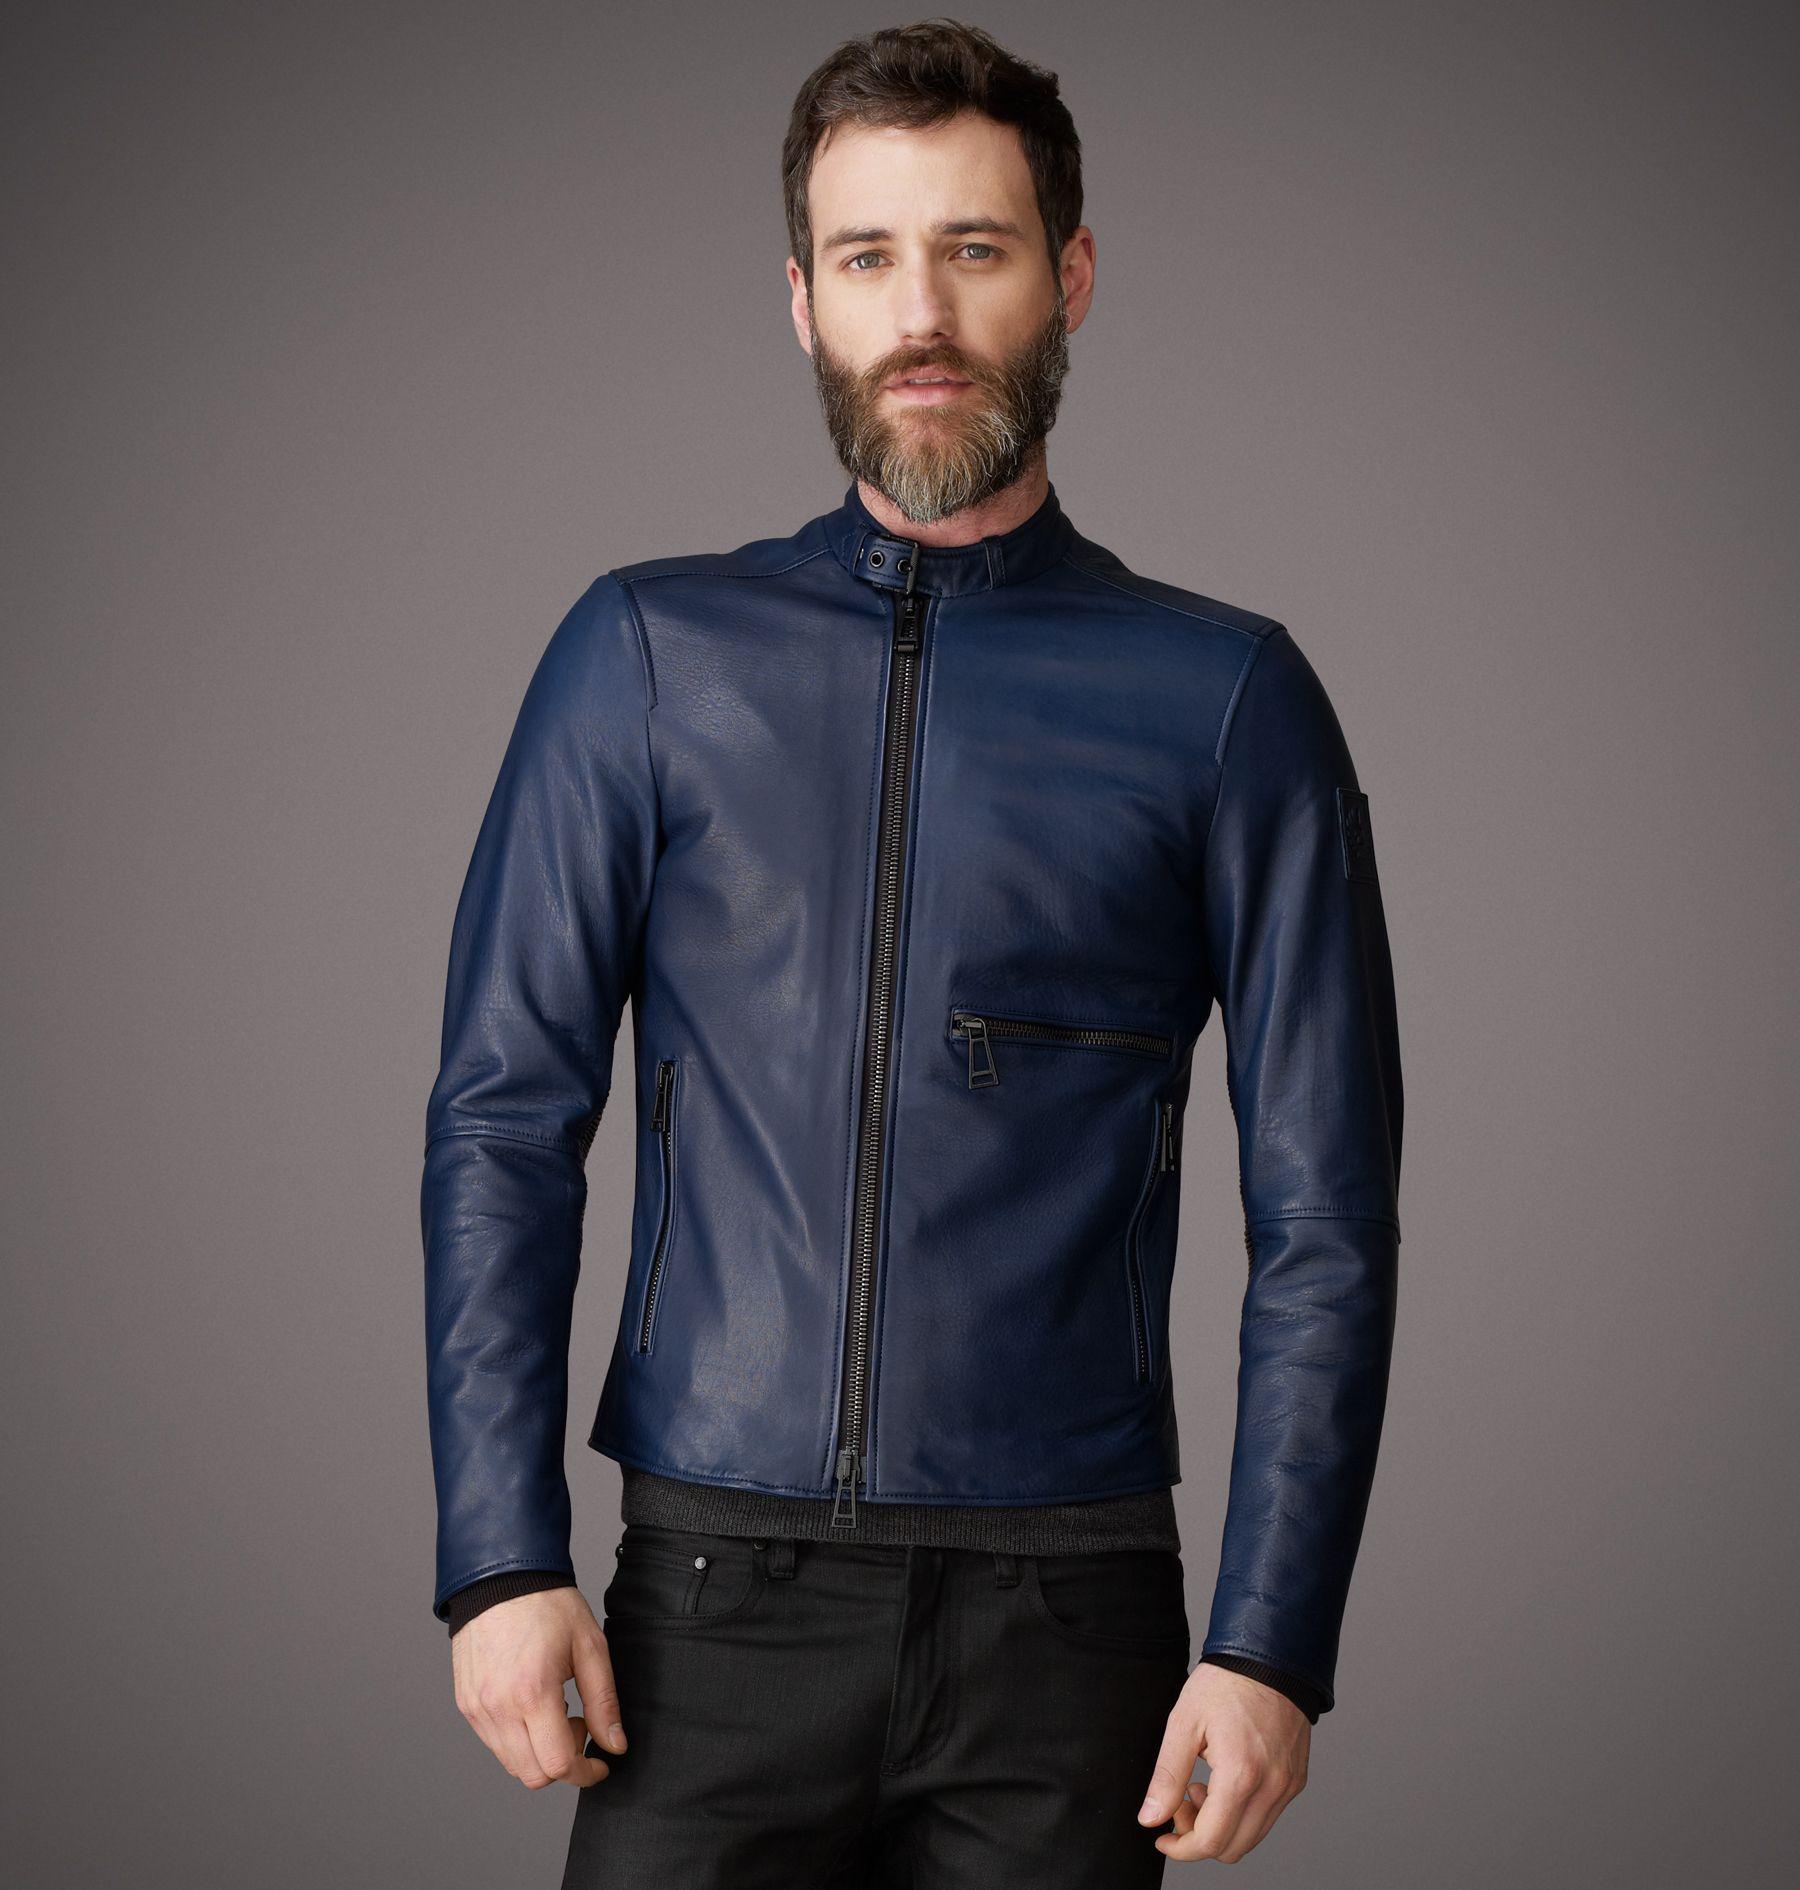 REDFIELD JACKET on Belstaff Designer jackets for men